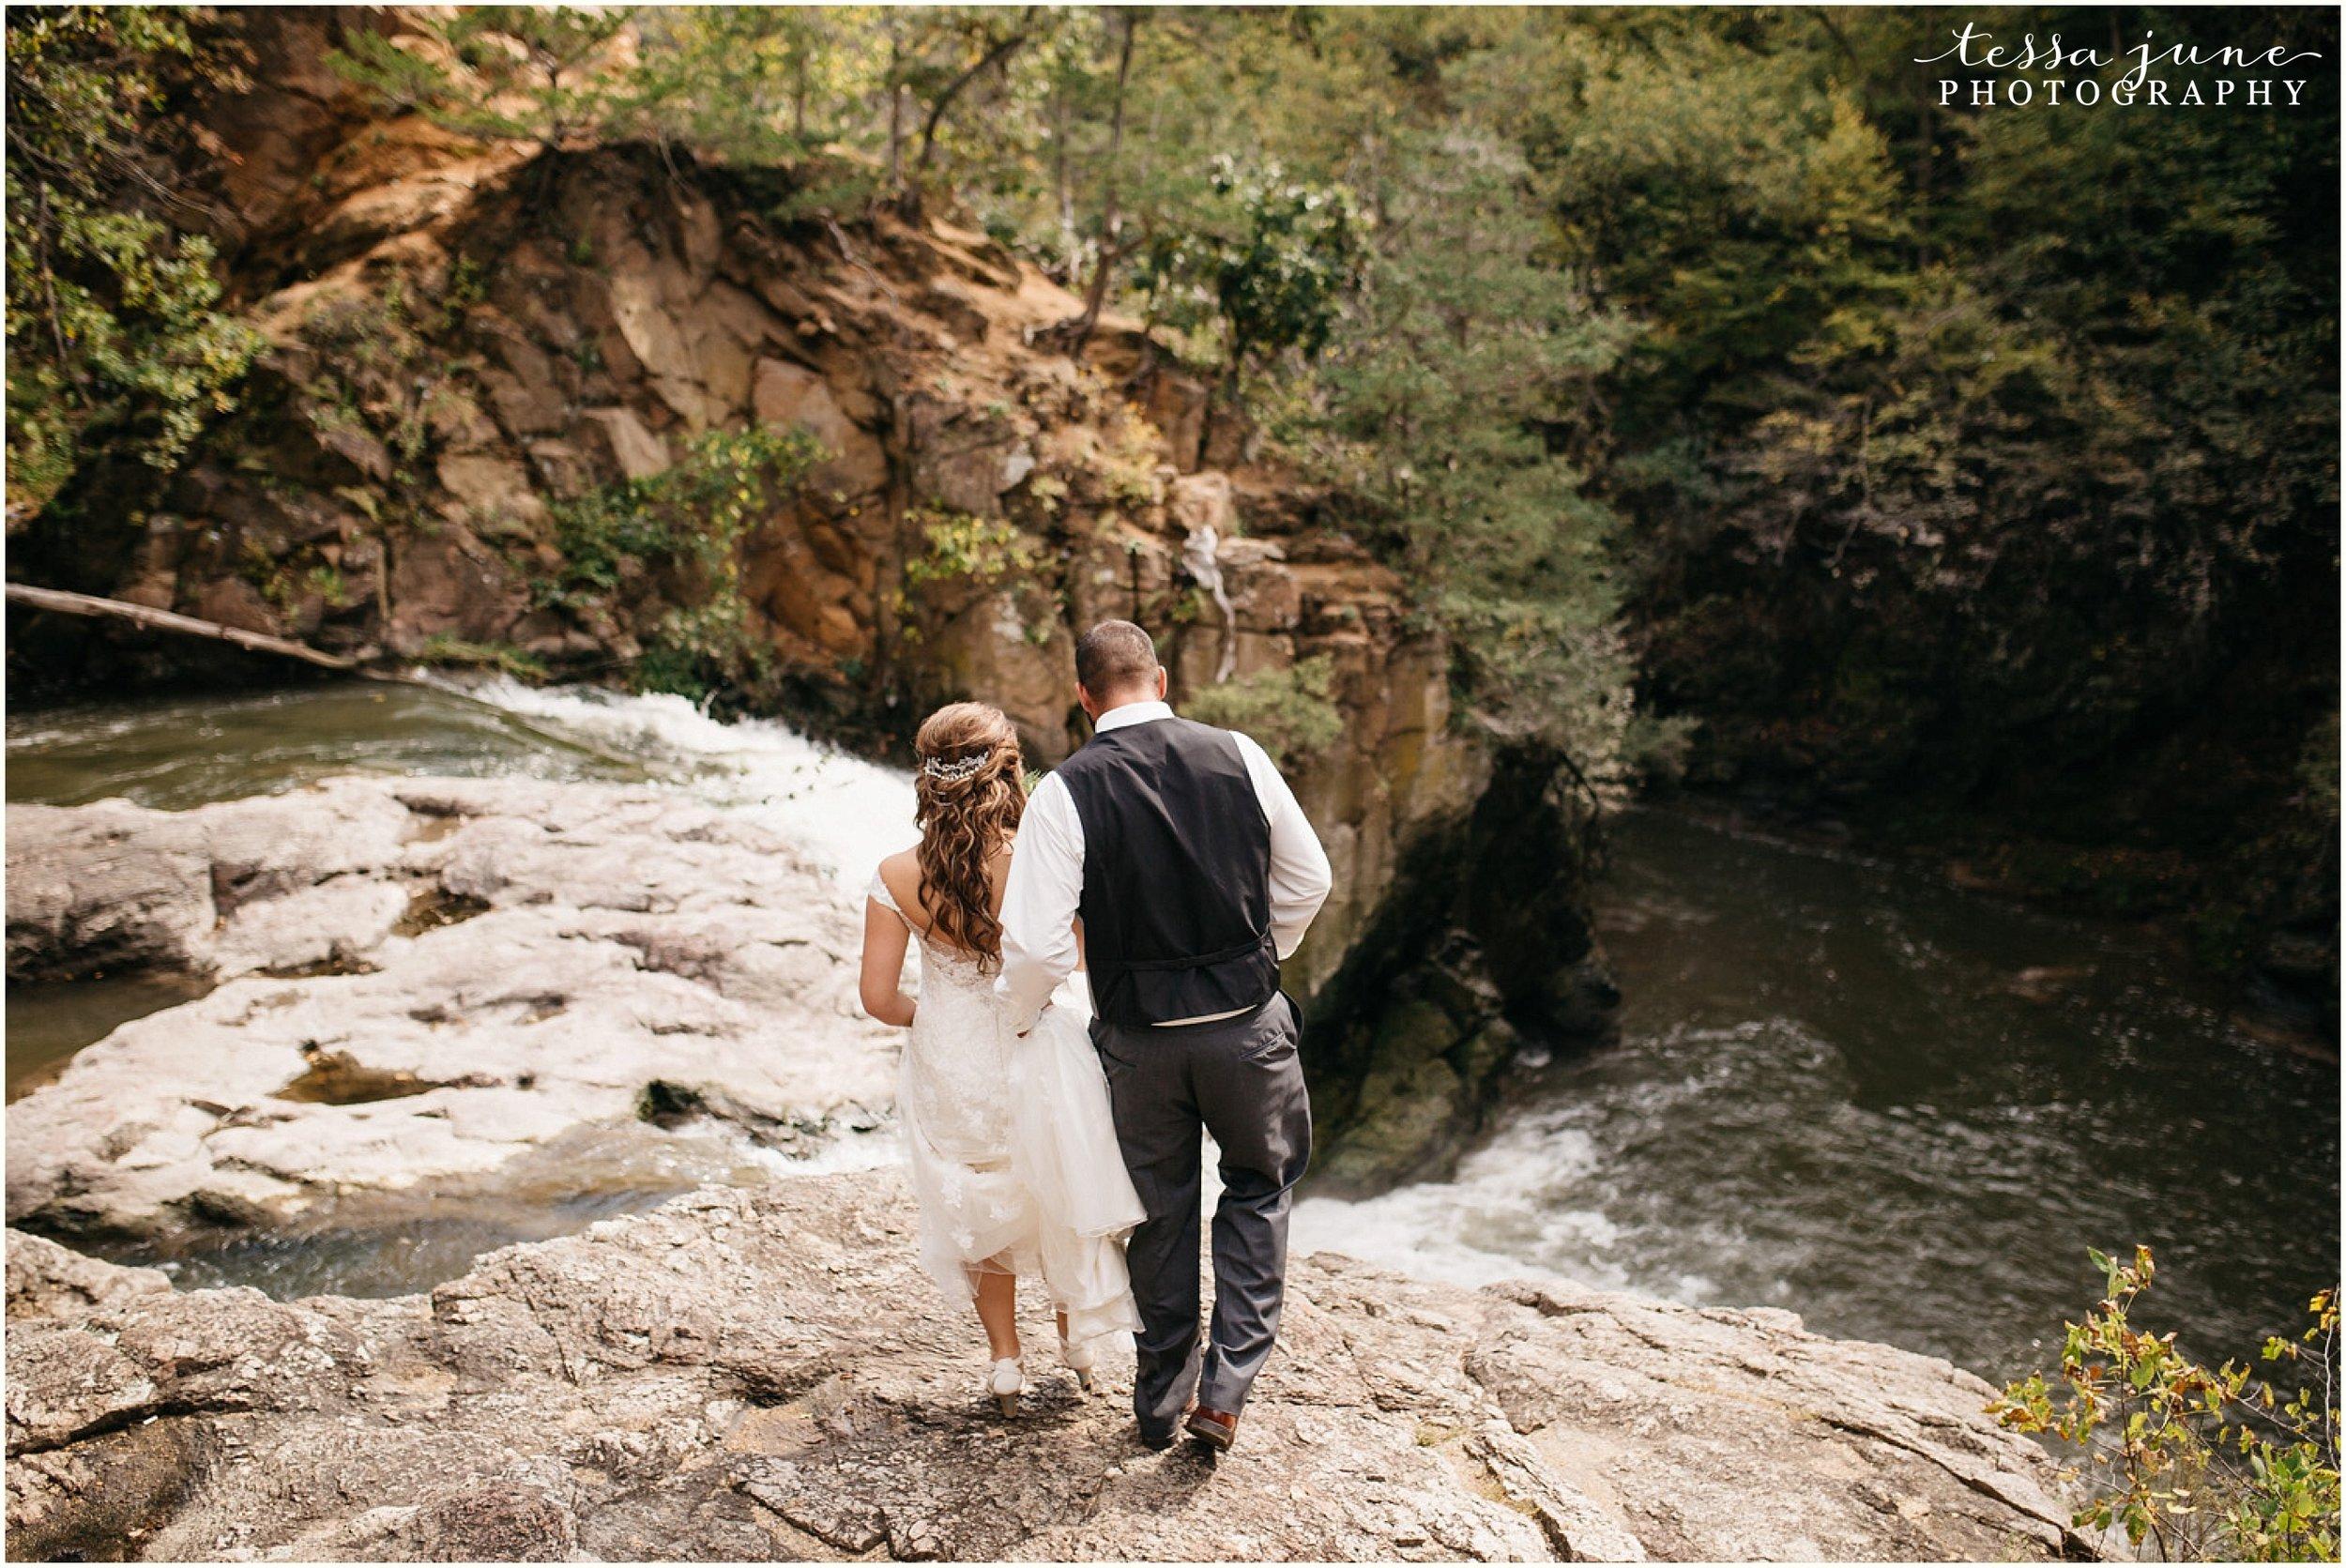 bohemian-minnesota-wedding-mismatched-bridesmaid-dresses-waterfall-st-cloud-tessa-june-photography-60.jpg